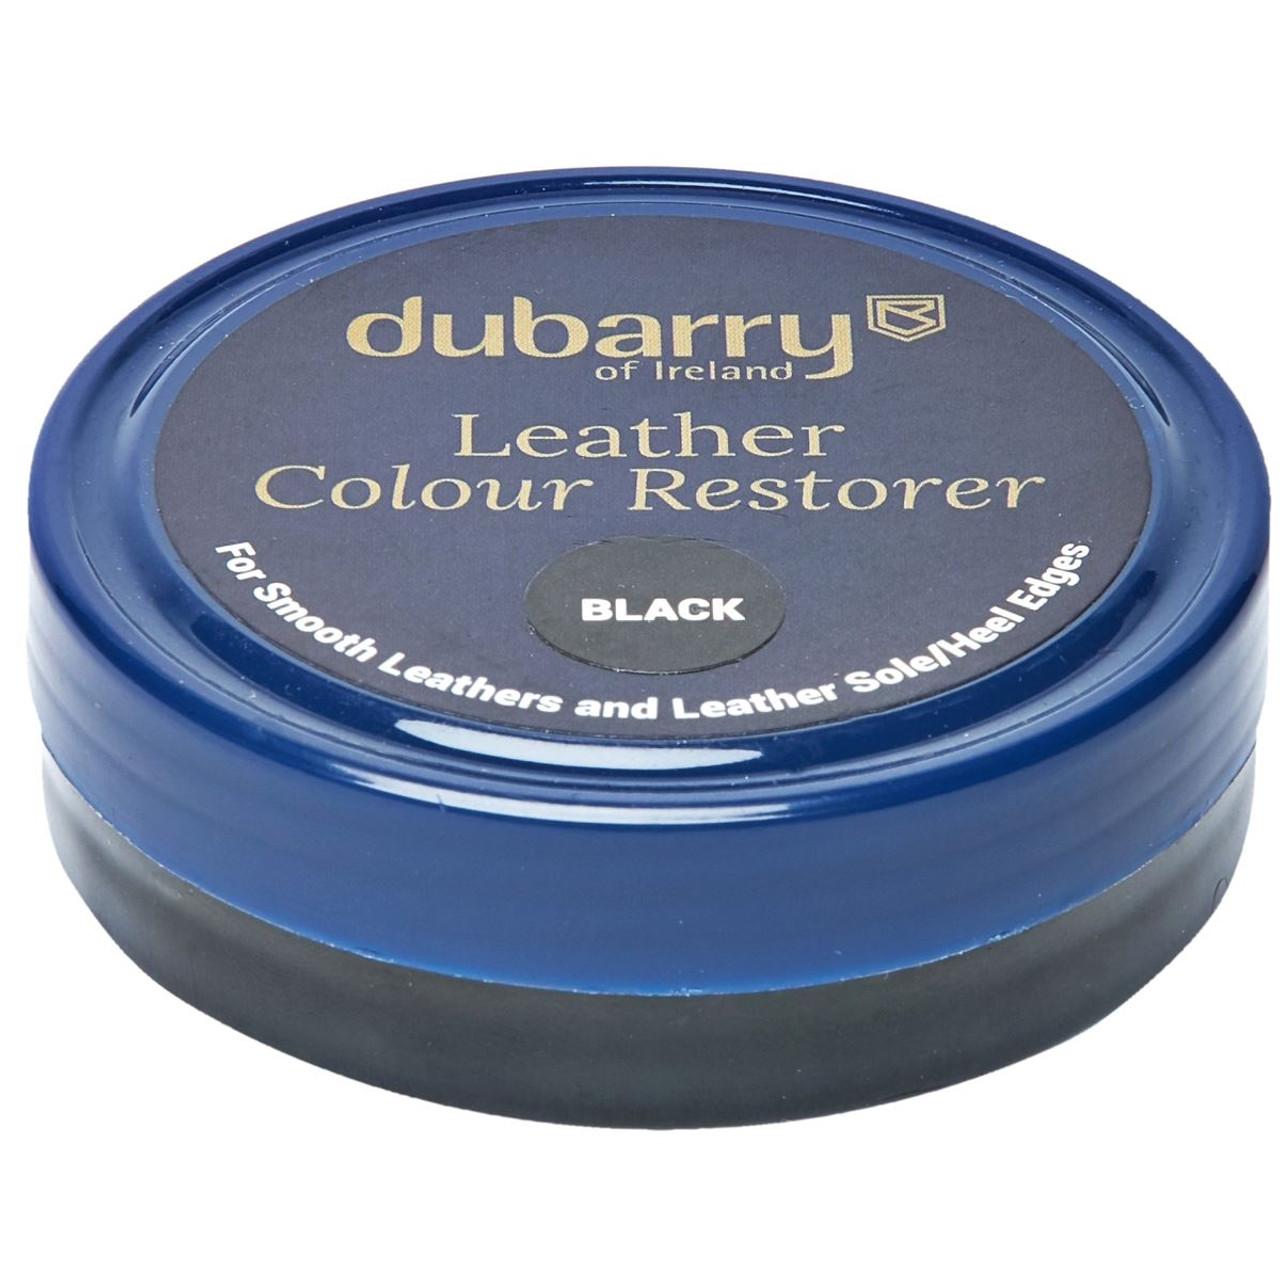 Dubarry Leather Colour Restorer Cream Black